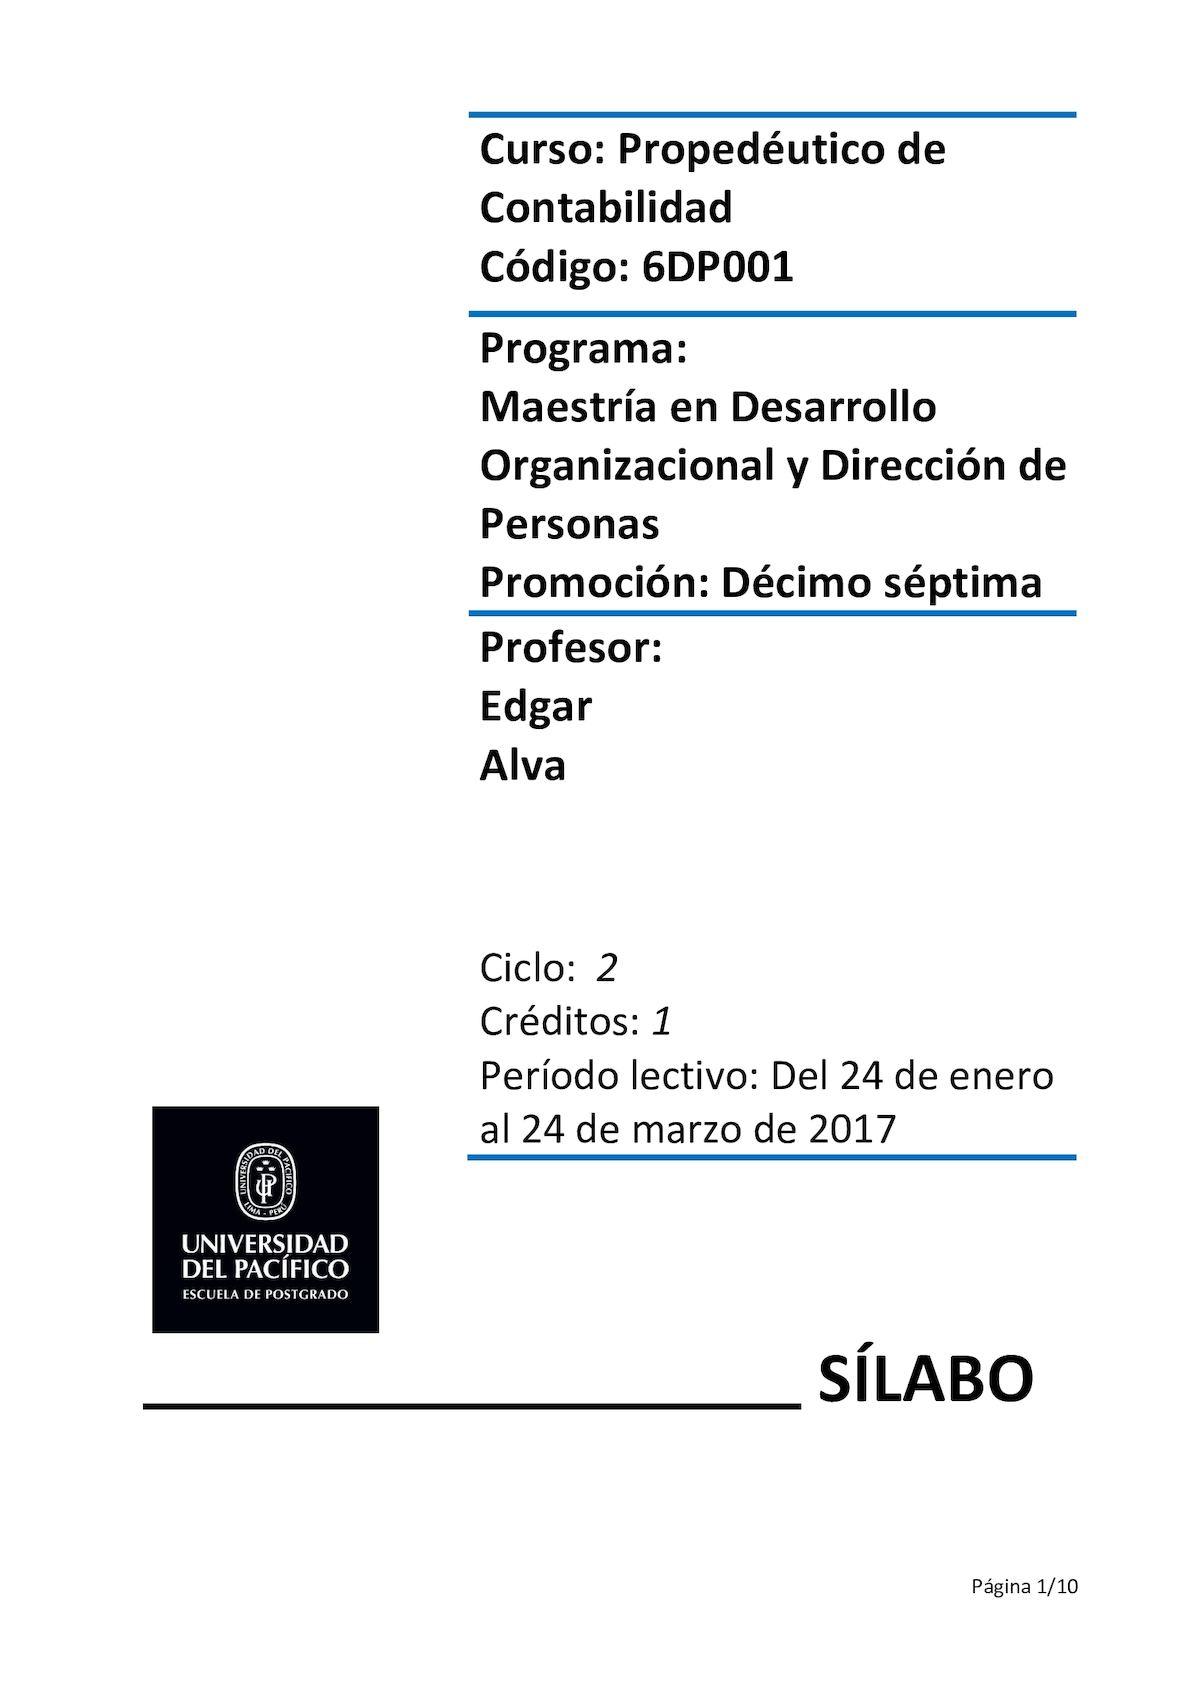 Sílabo Propedéutico de Contabilidad [MDO17]